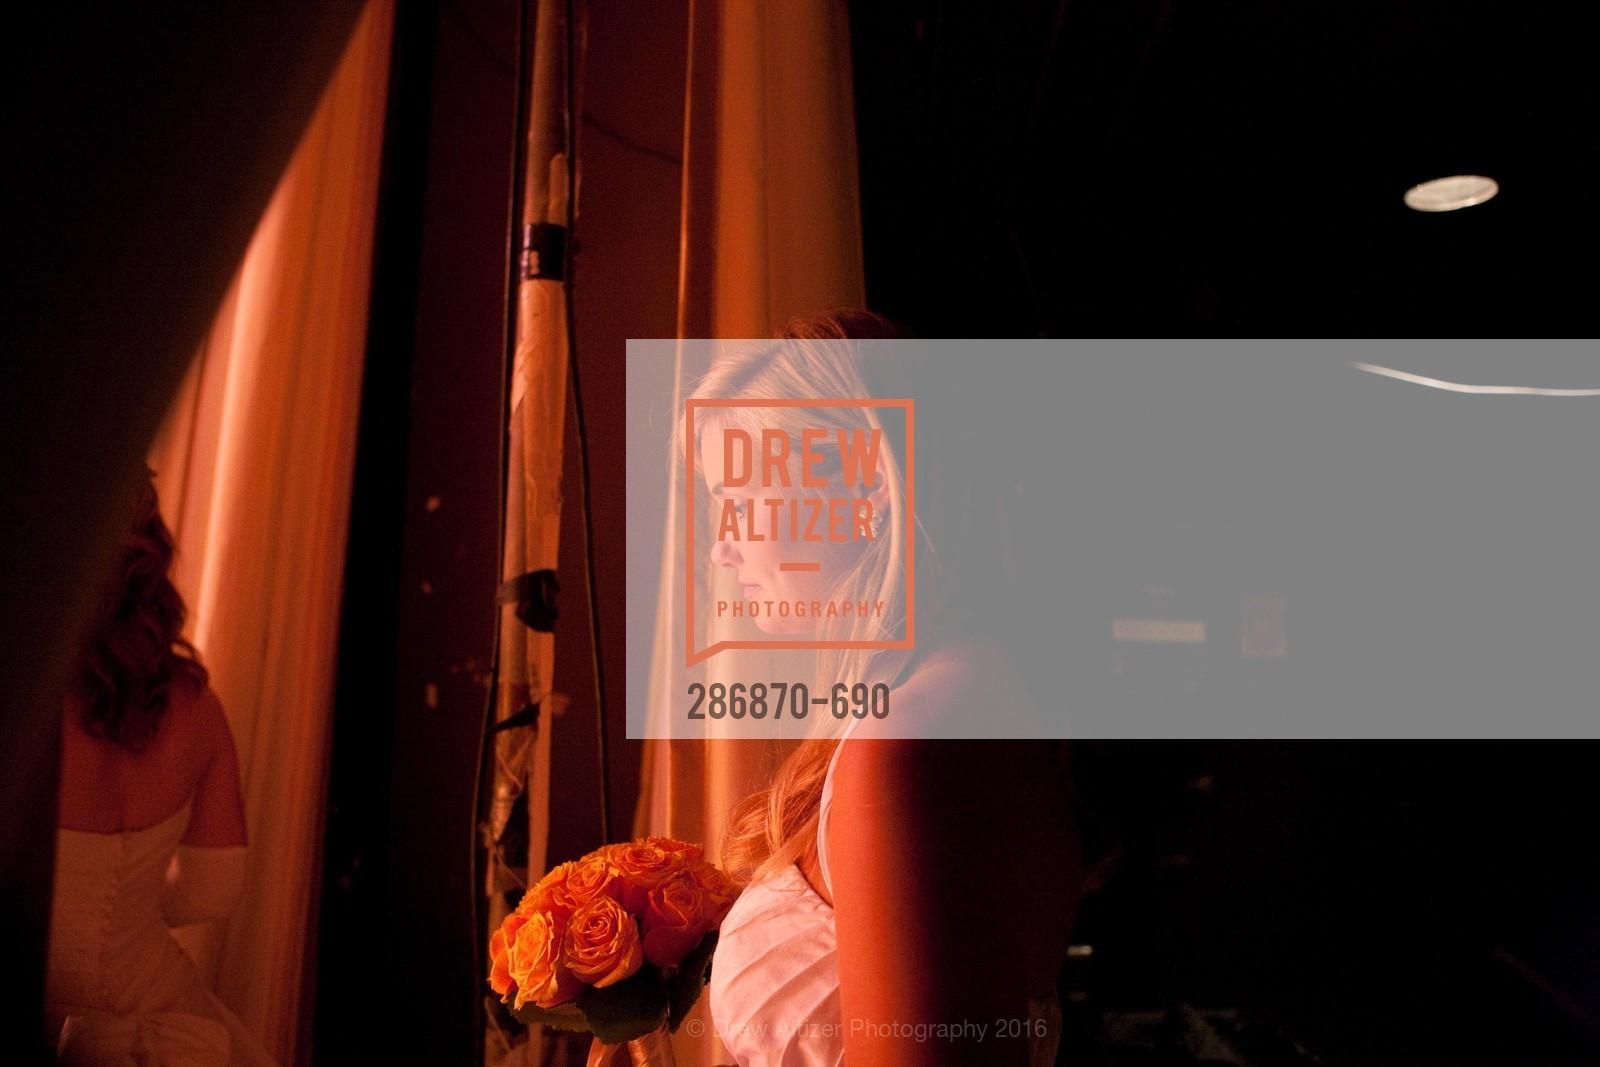 Emma Giorgianna Jesberg, 2009 Debutante Ball, Unknown, July 4th, 2008,Drew Altizer, Drew Altizer Photography, full-service agency, private events, San Francisco photographer, photographer california